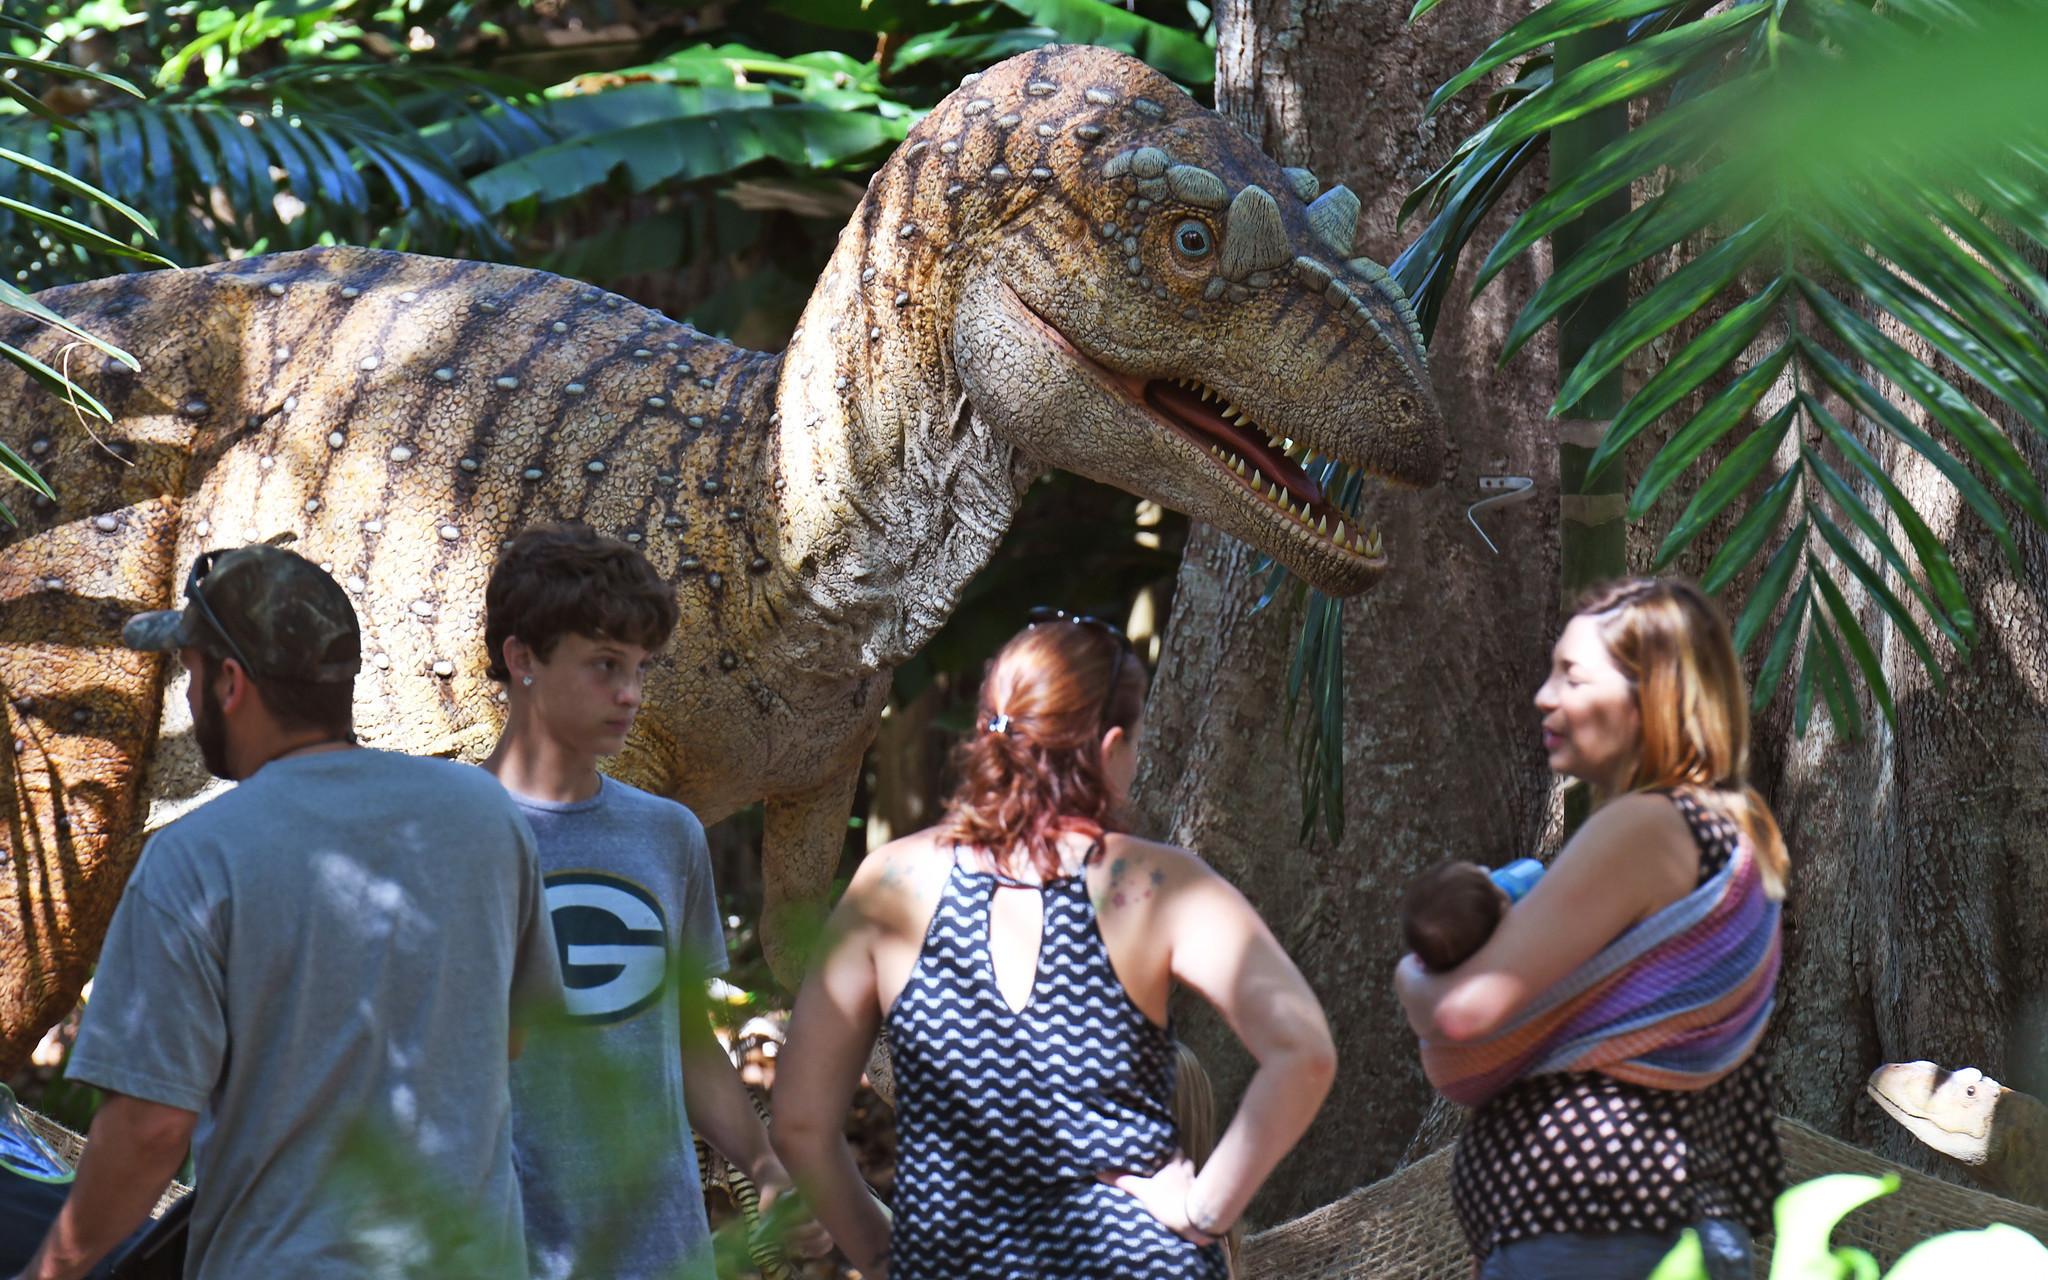 Flamingo gardens showcases dinosaur fossils life sized - Flamingo gardens fort lauderdale ...